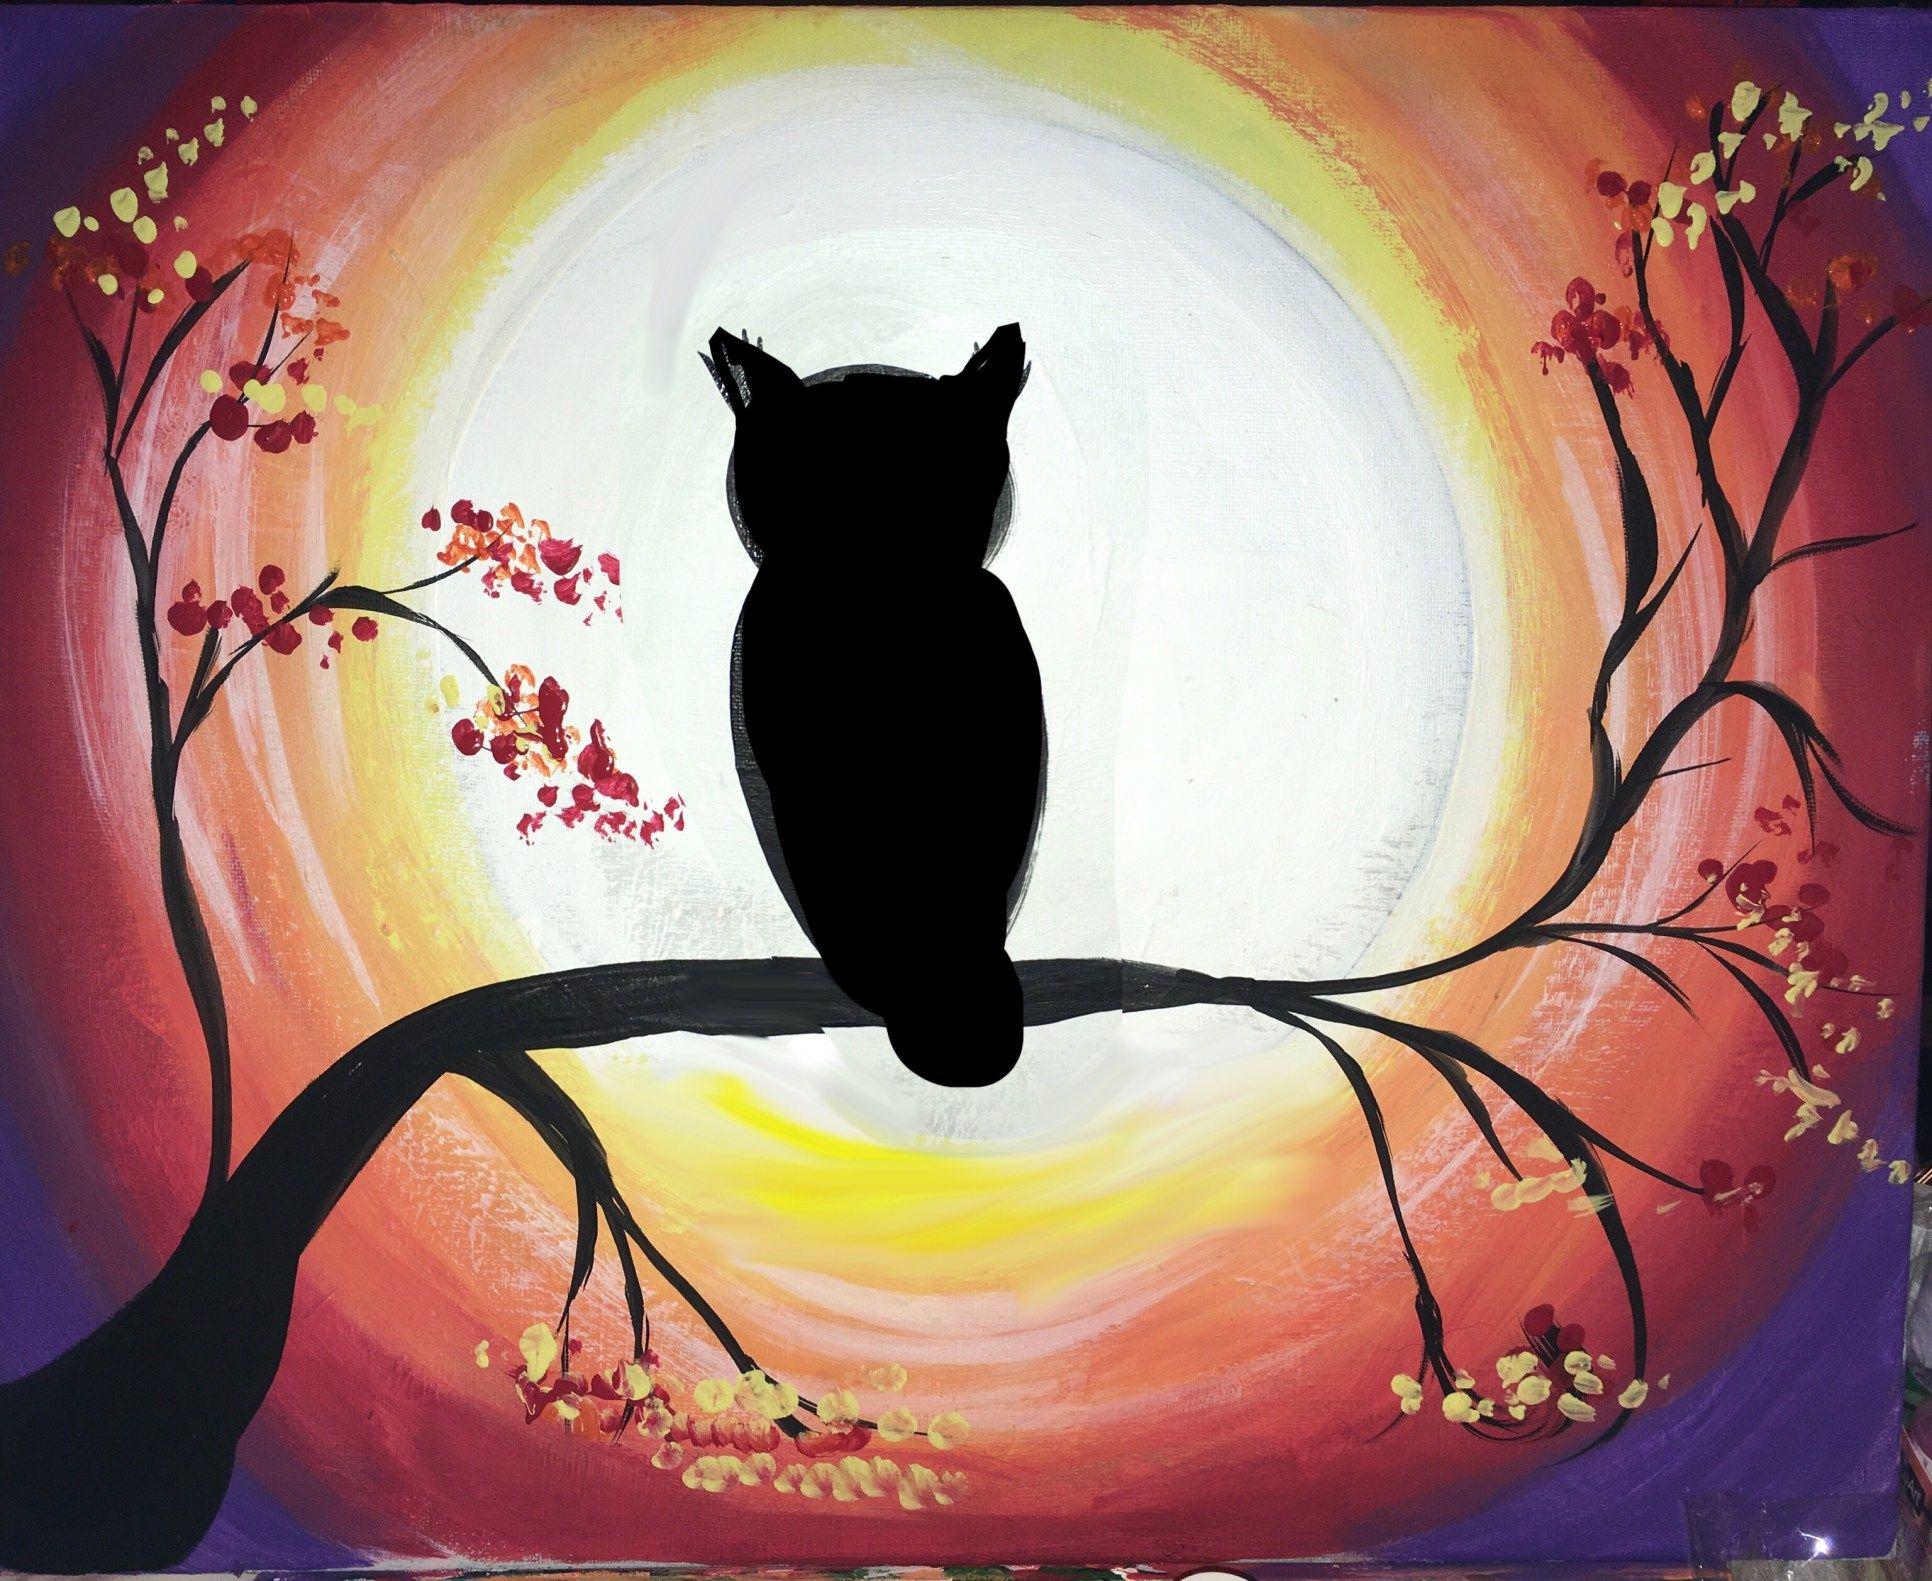 Step by step painting free online tutorials painting ideas step by step painting free online tutorials baditri Gallery